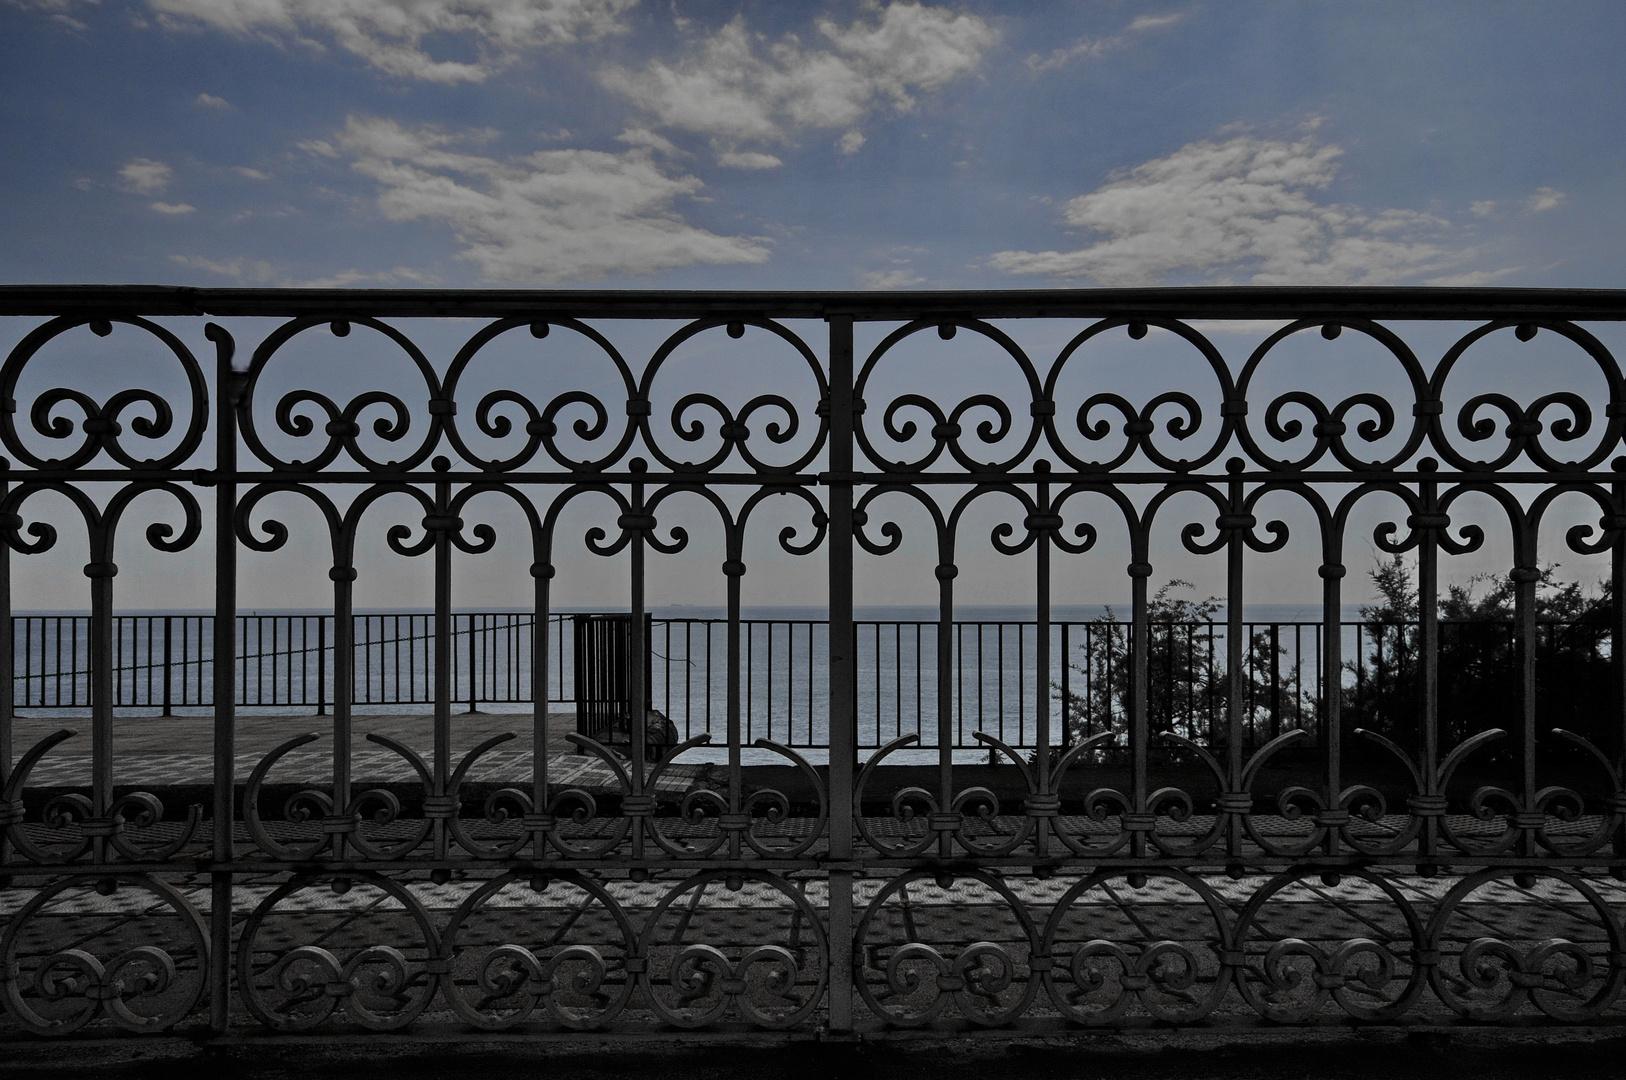 barrieren.......